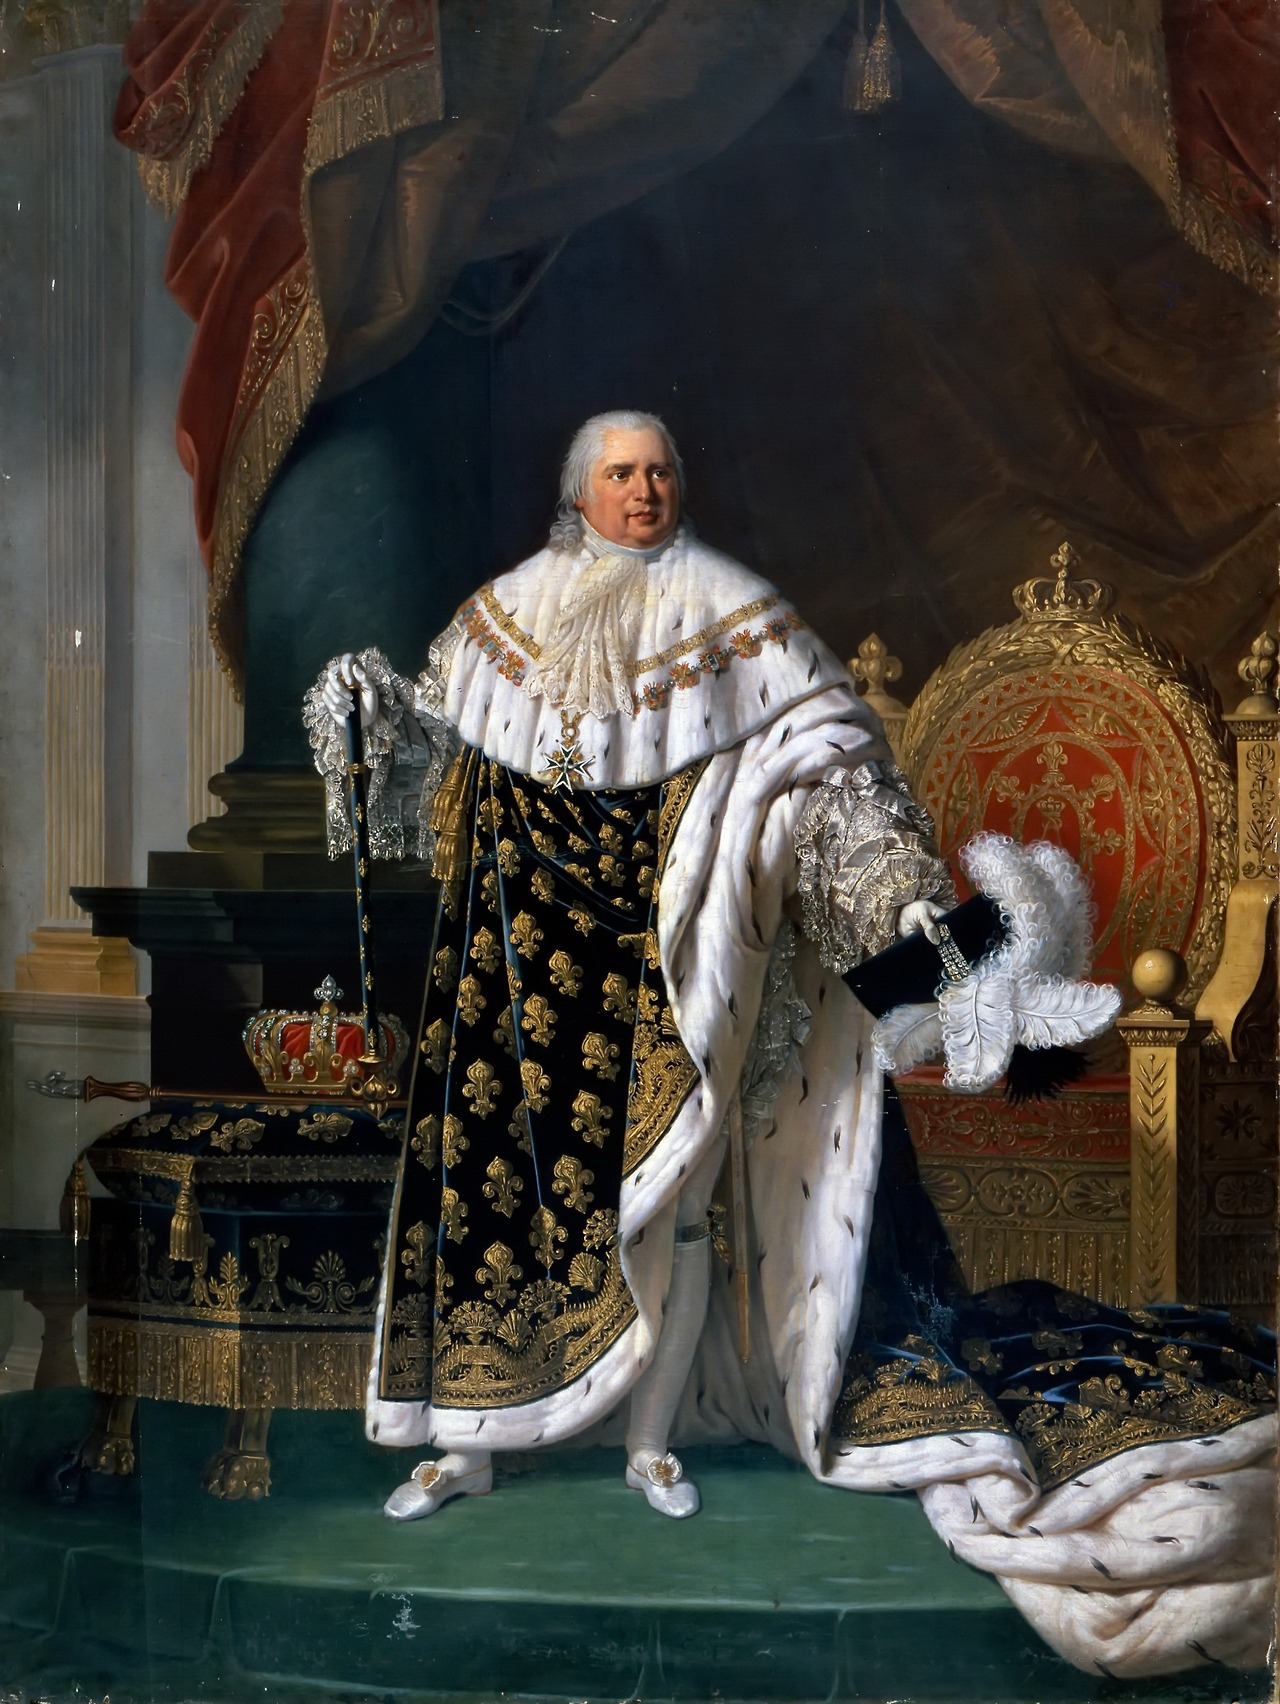 Fichier:Lefèvre - Louis XVIII of France in Coronation Robes.jpg — Wikipédia